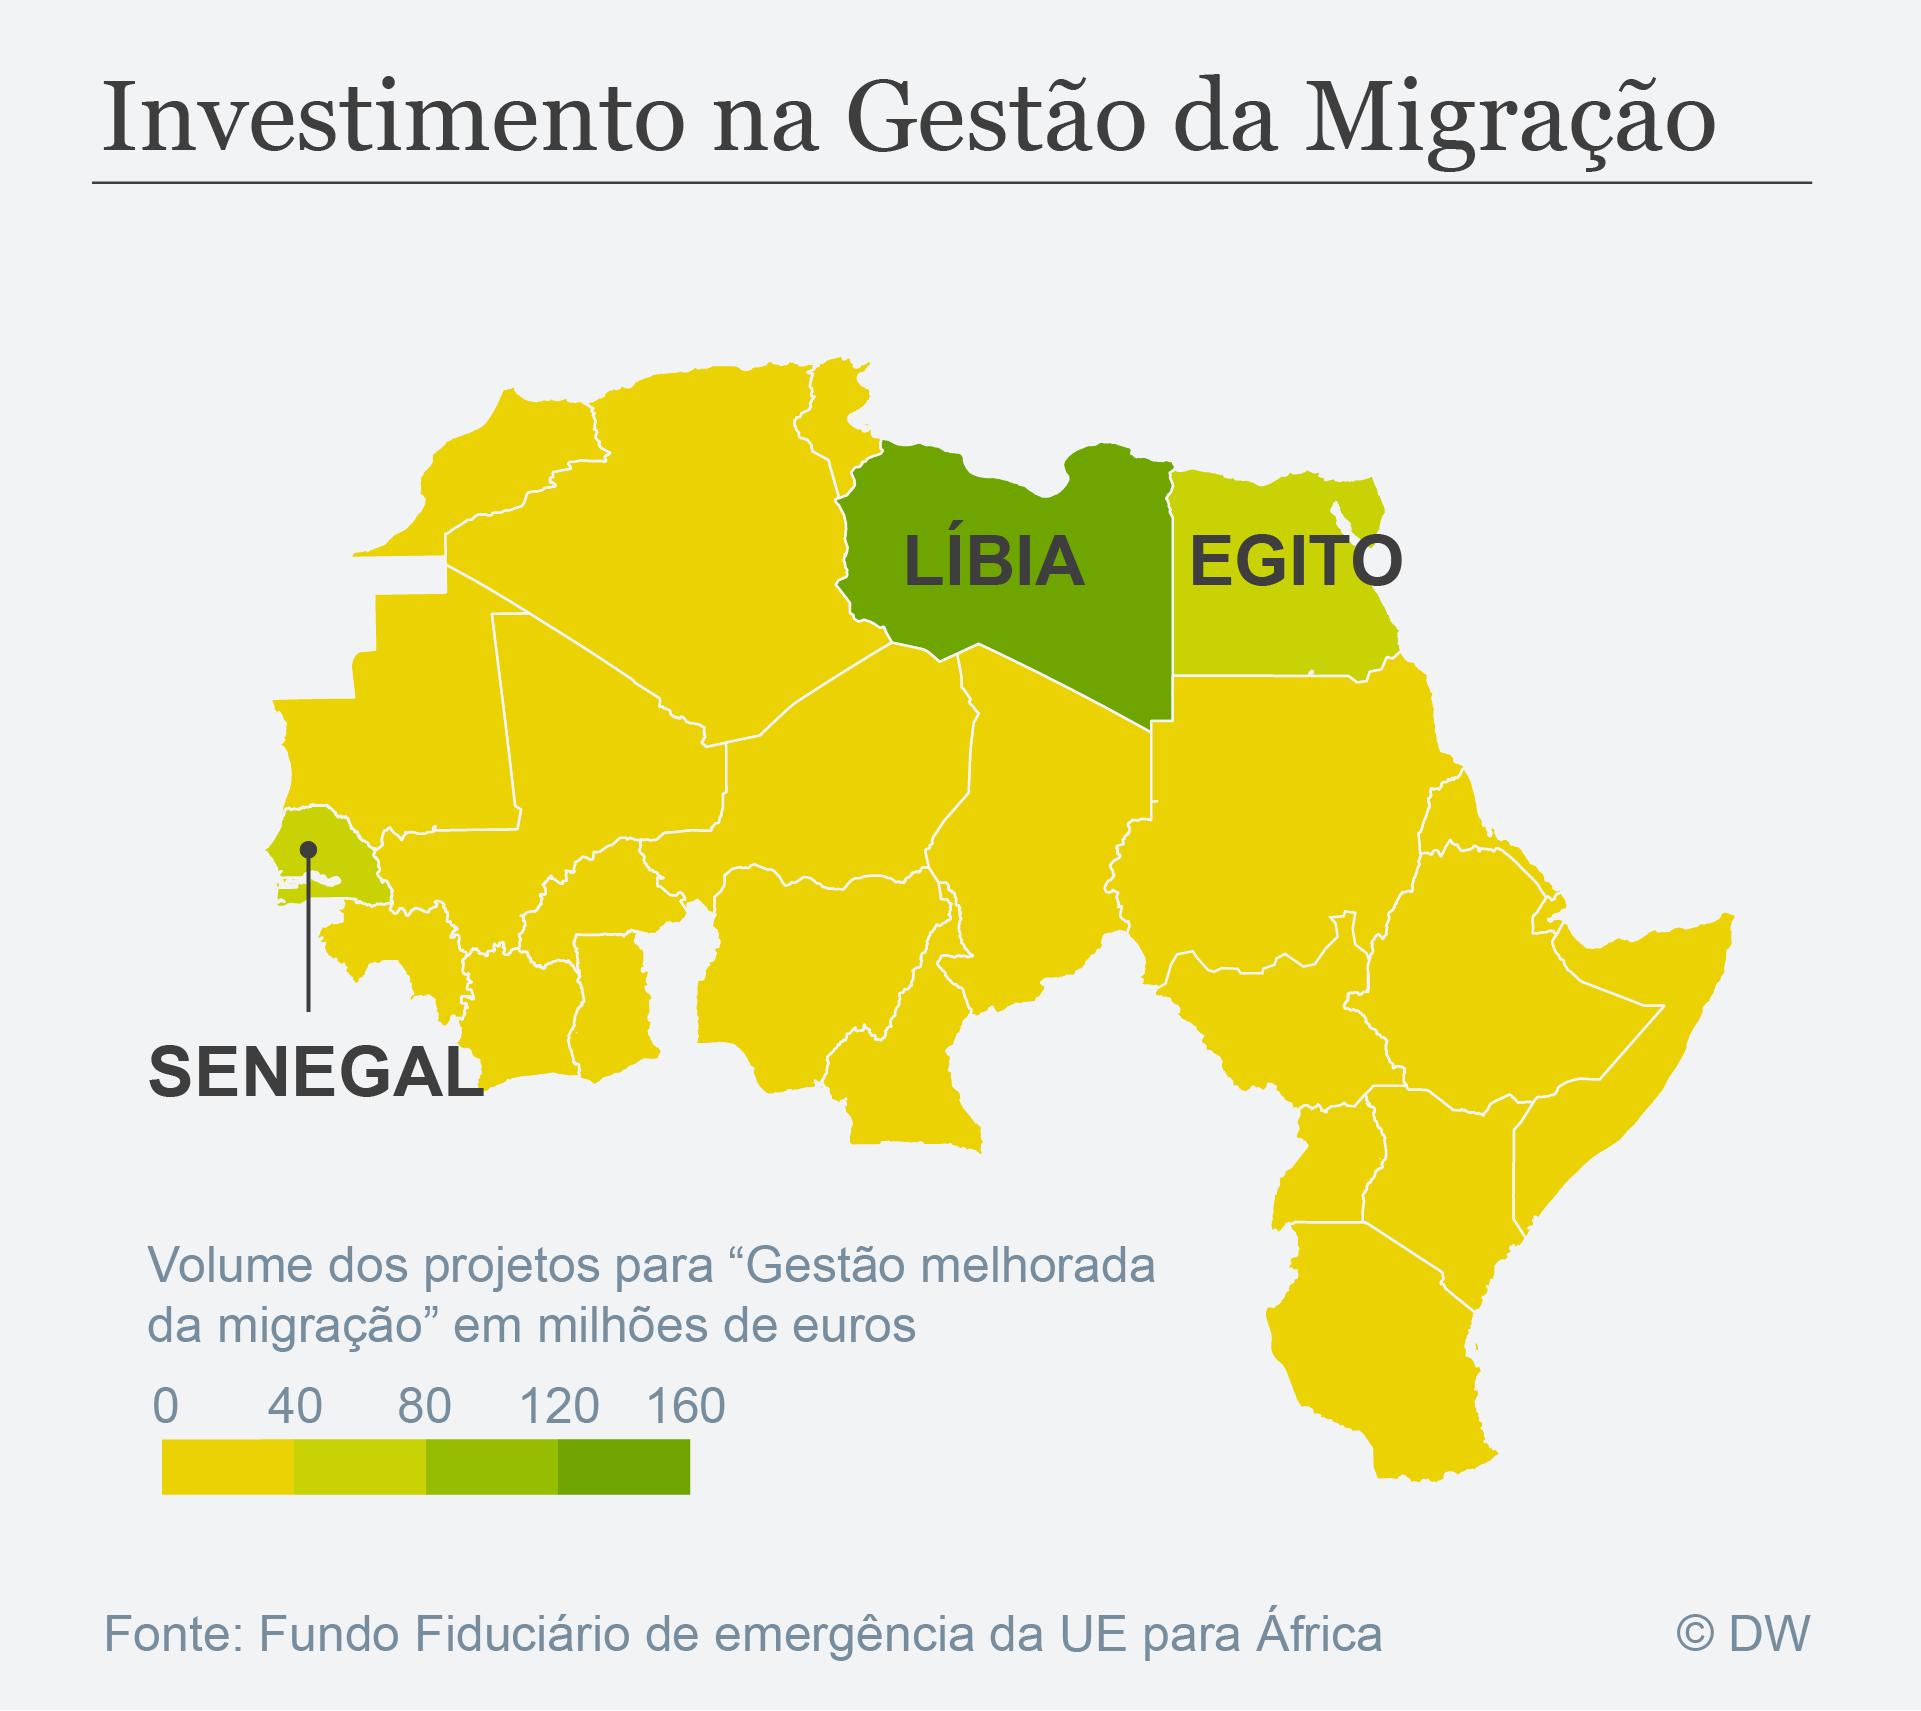 Datenvisualisierung Portugiesisch Investimento na Gestao da Migracao